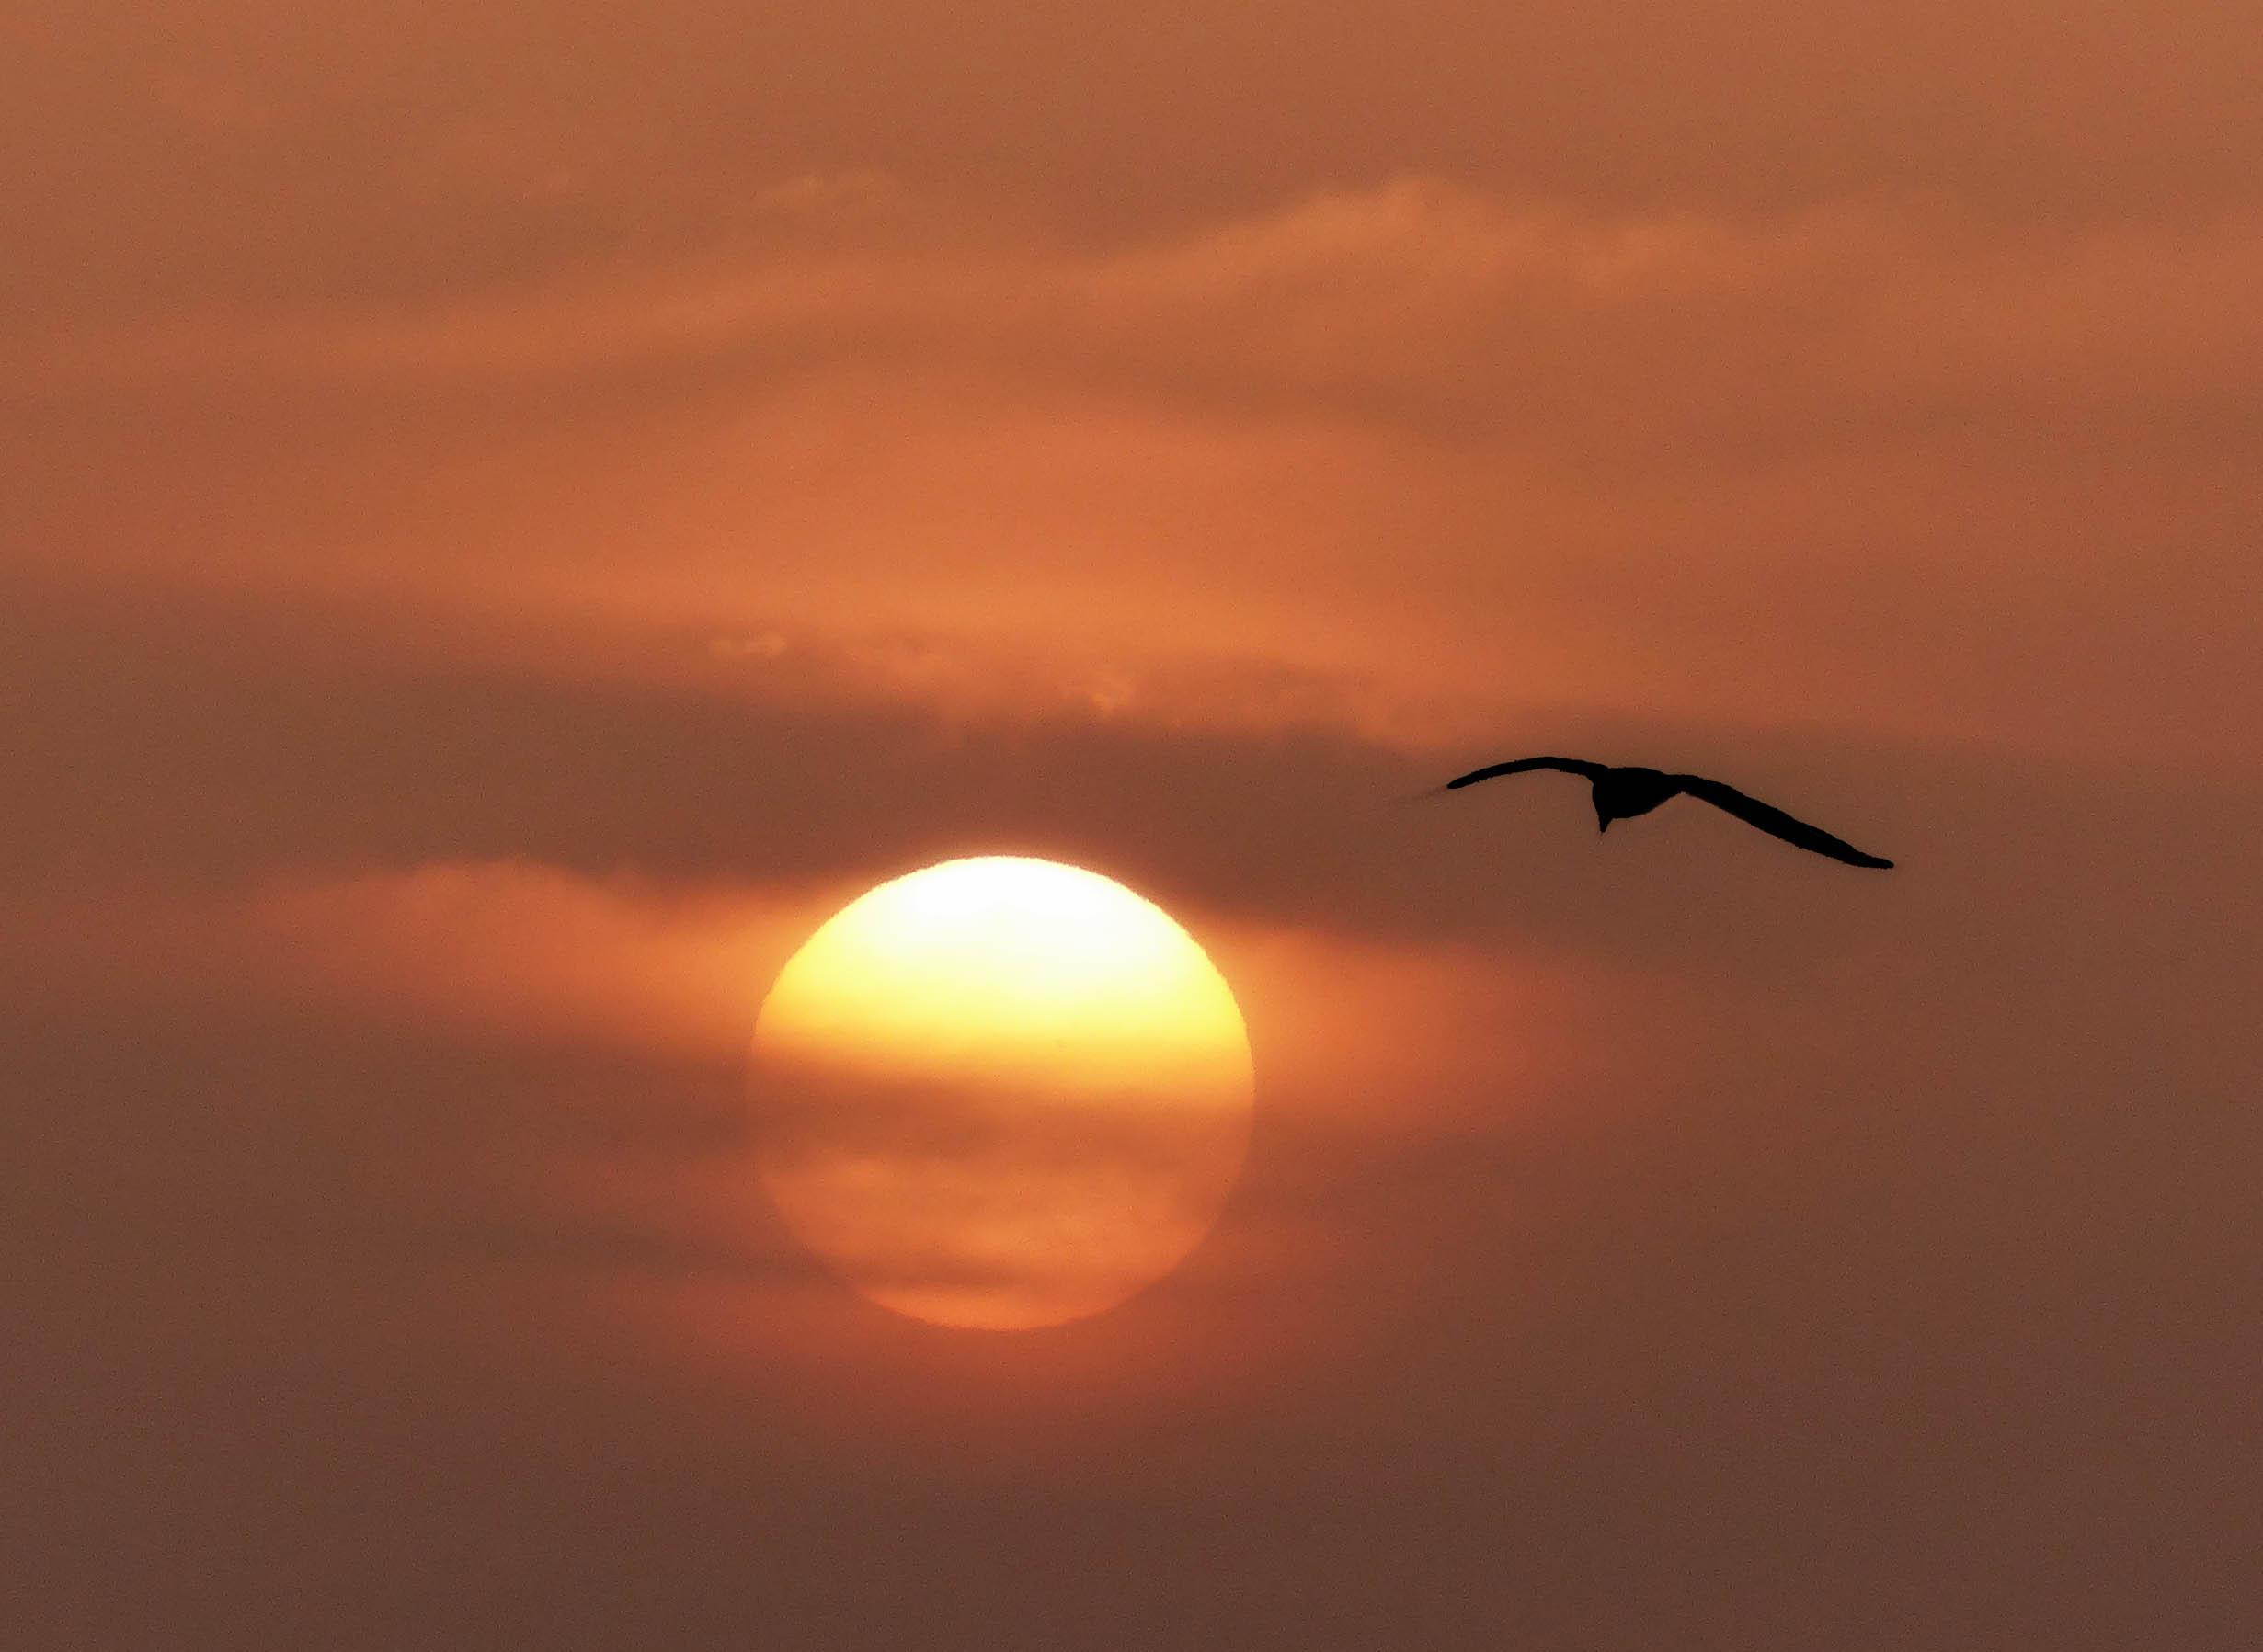 Gull flying past sun with orange sky